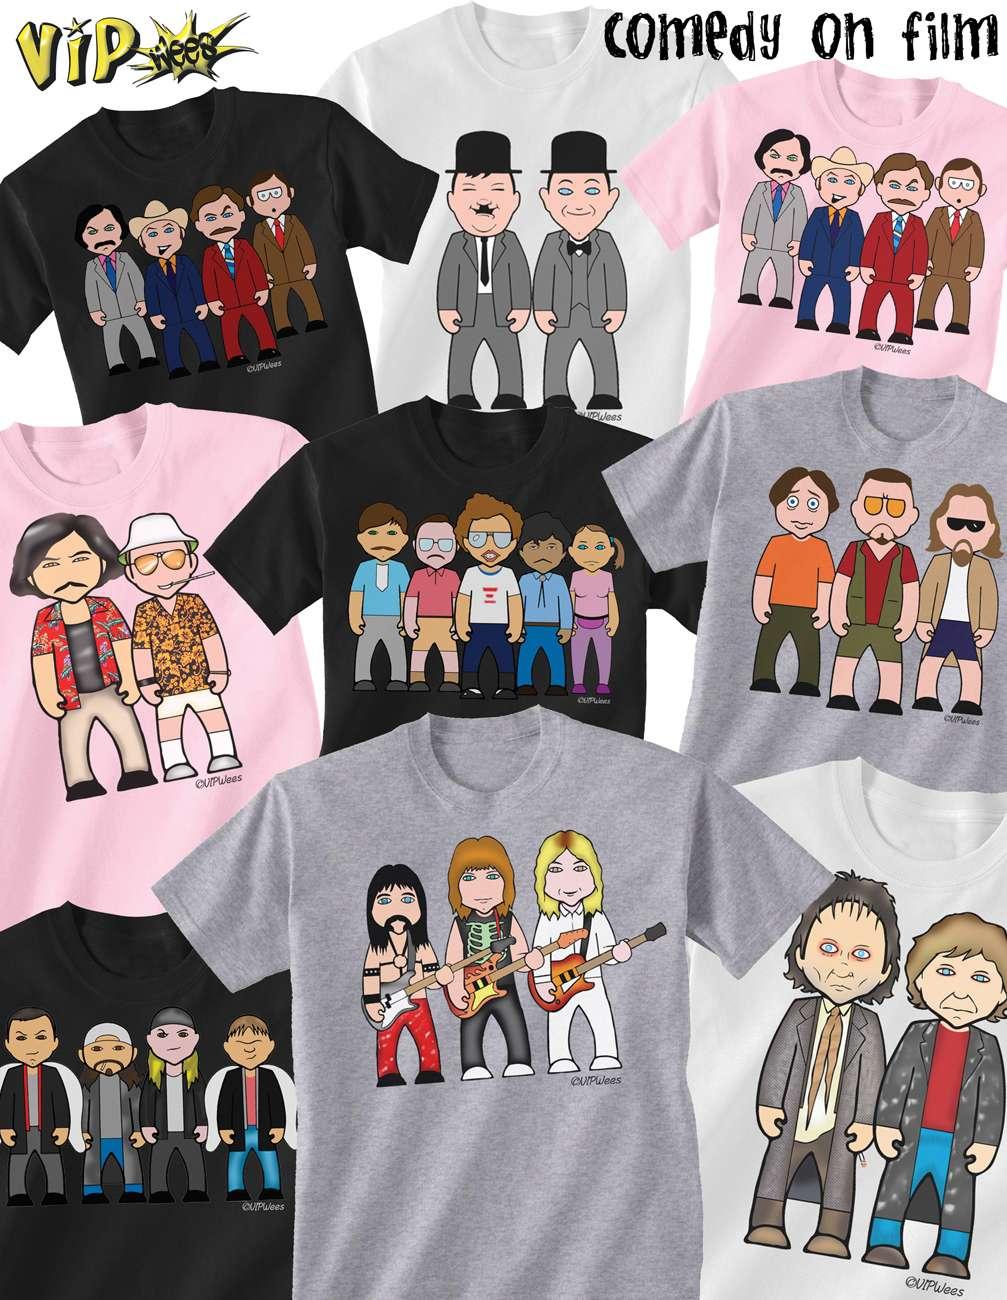 VIPwees Childrens Unisex T-Shirt Pop Music Inspired Caricatures Choose Design